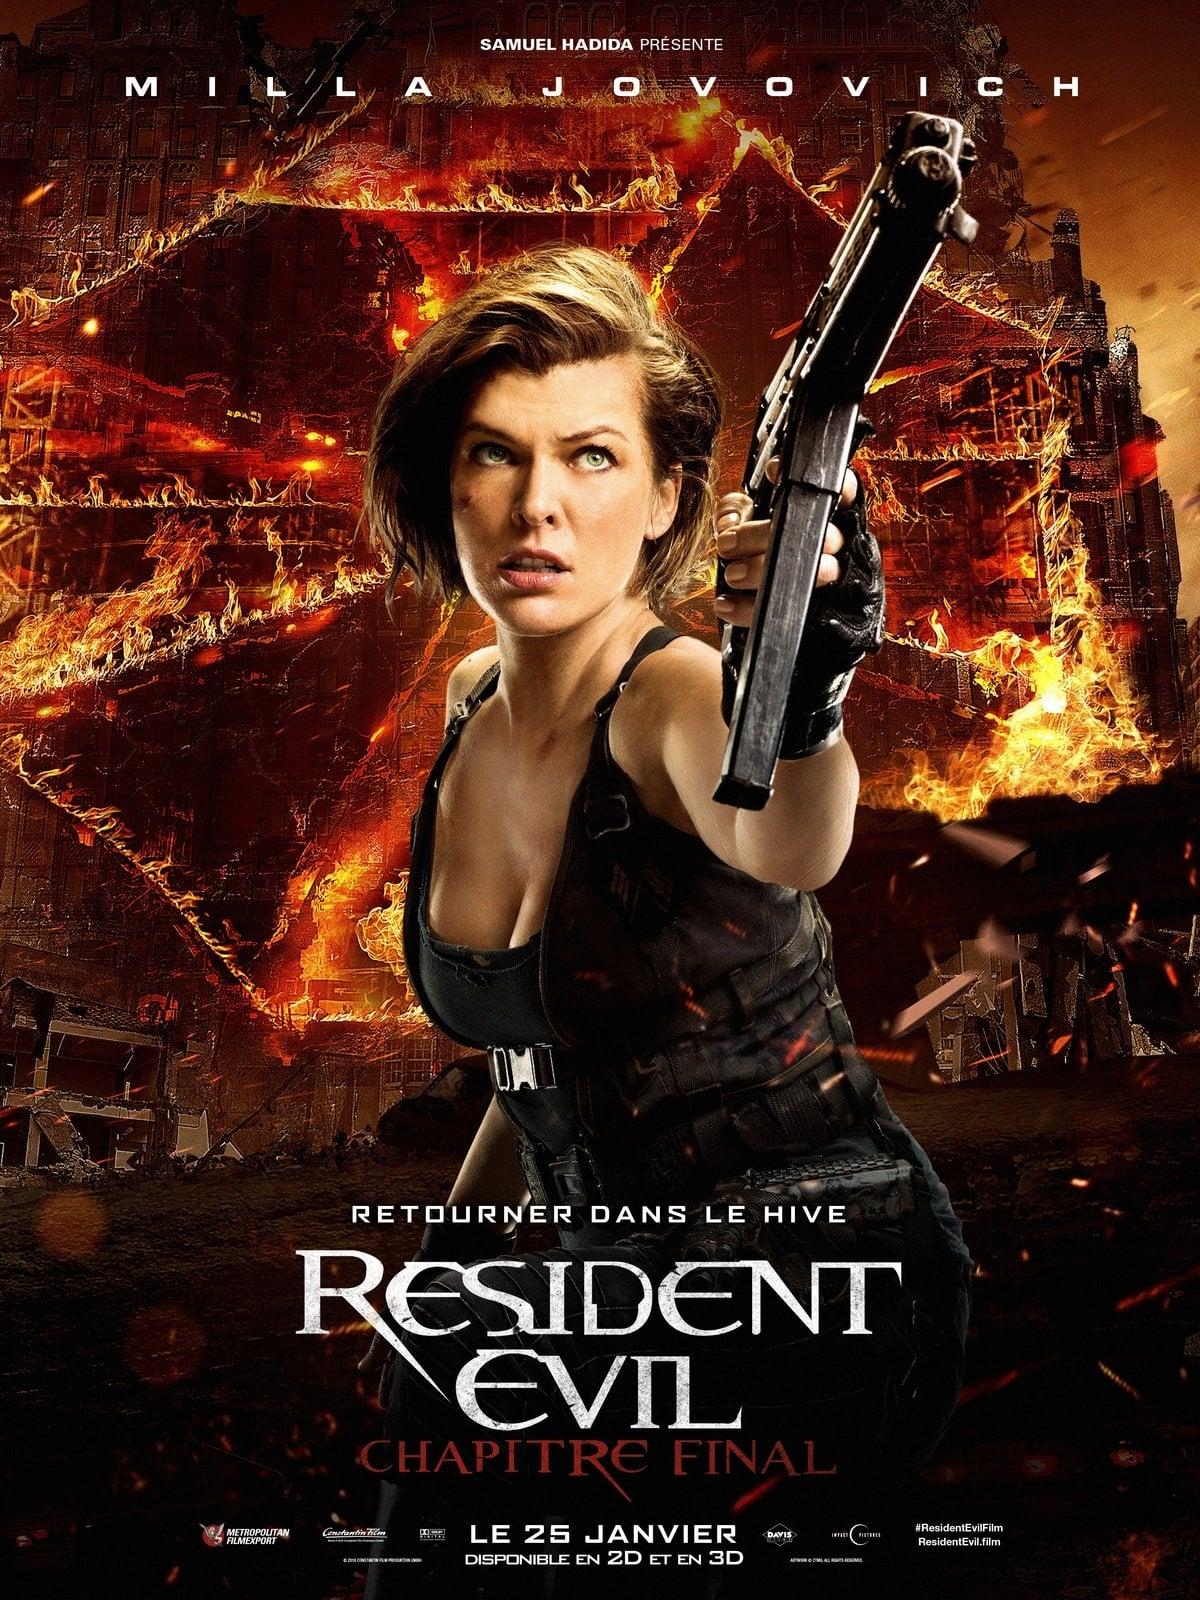 Resident Evil Chapitre Final Streaming : resident, chapitre, final, streaming, Resident, Chapitre, Final, Streaming, Voirfilms